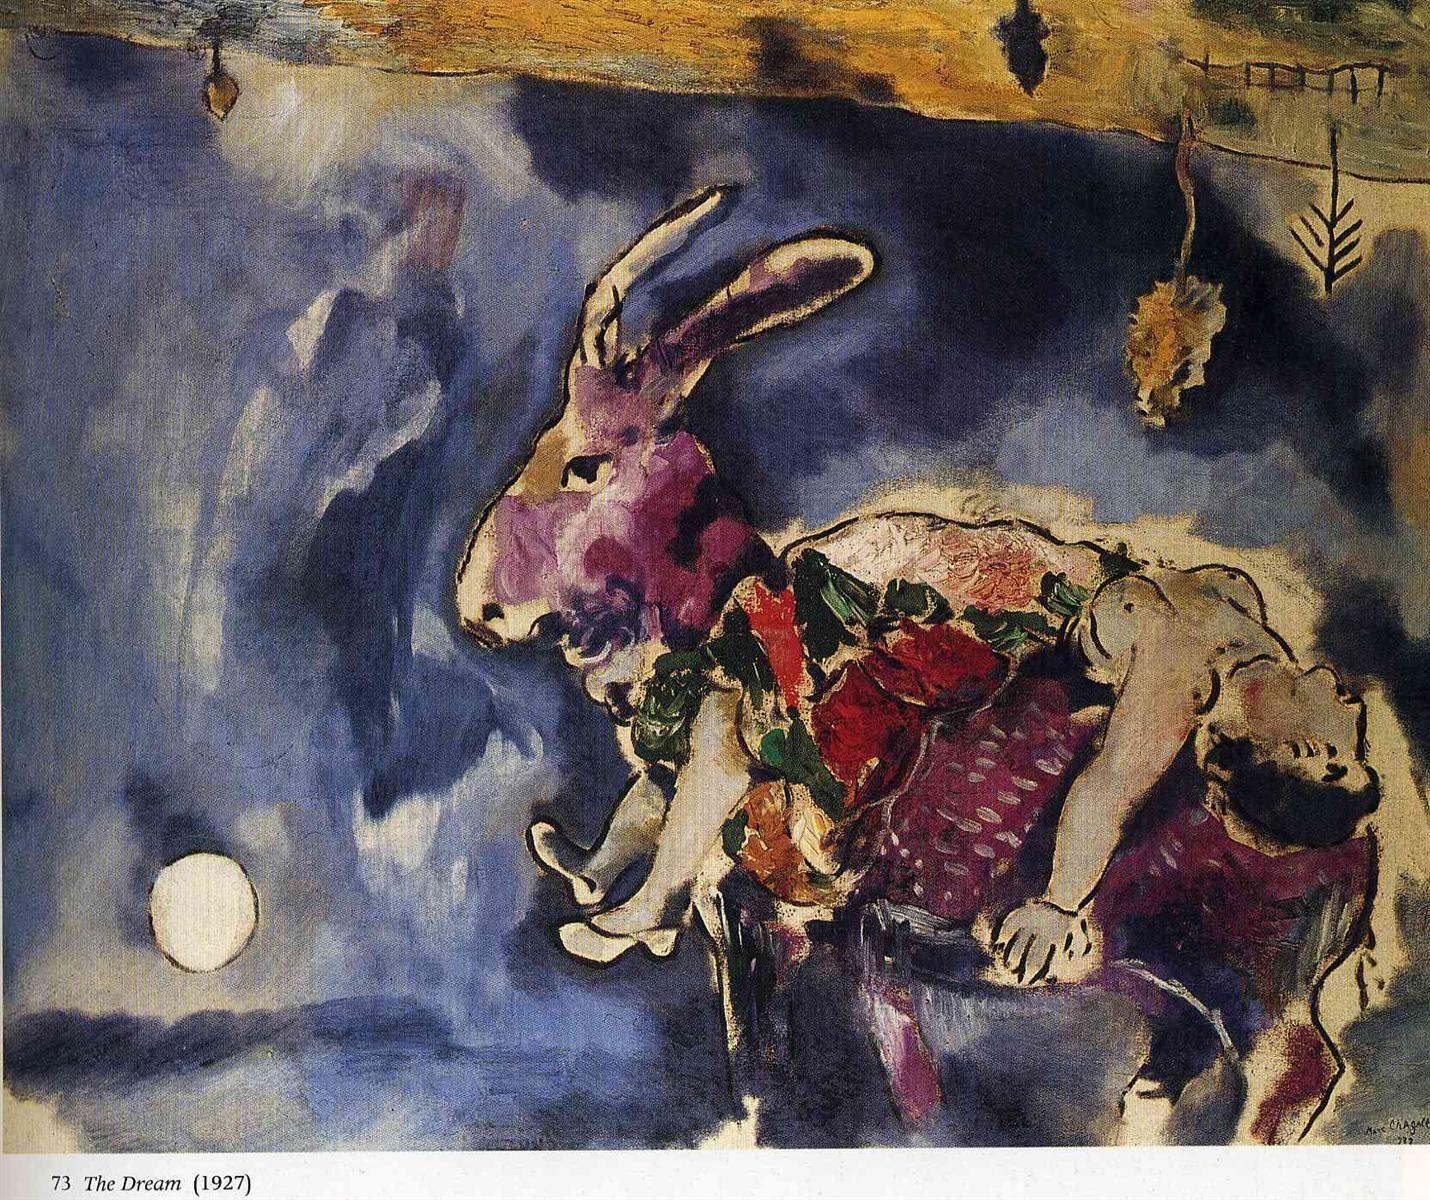 Marc Chagall, The dream (The rabbit), 1927